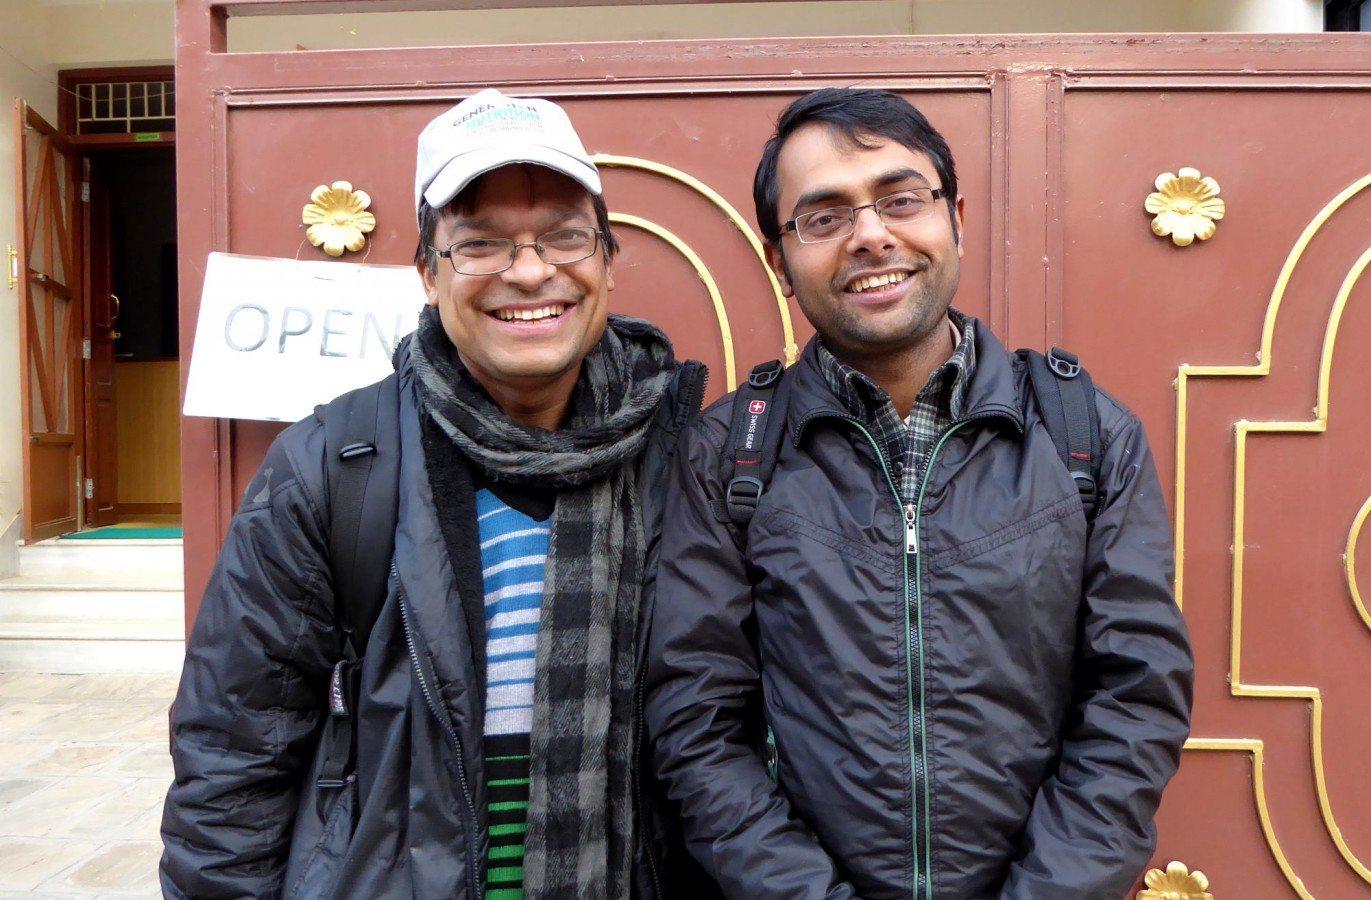 Ram Hari Adhikari and Suresh Kumar Sarma